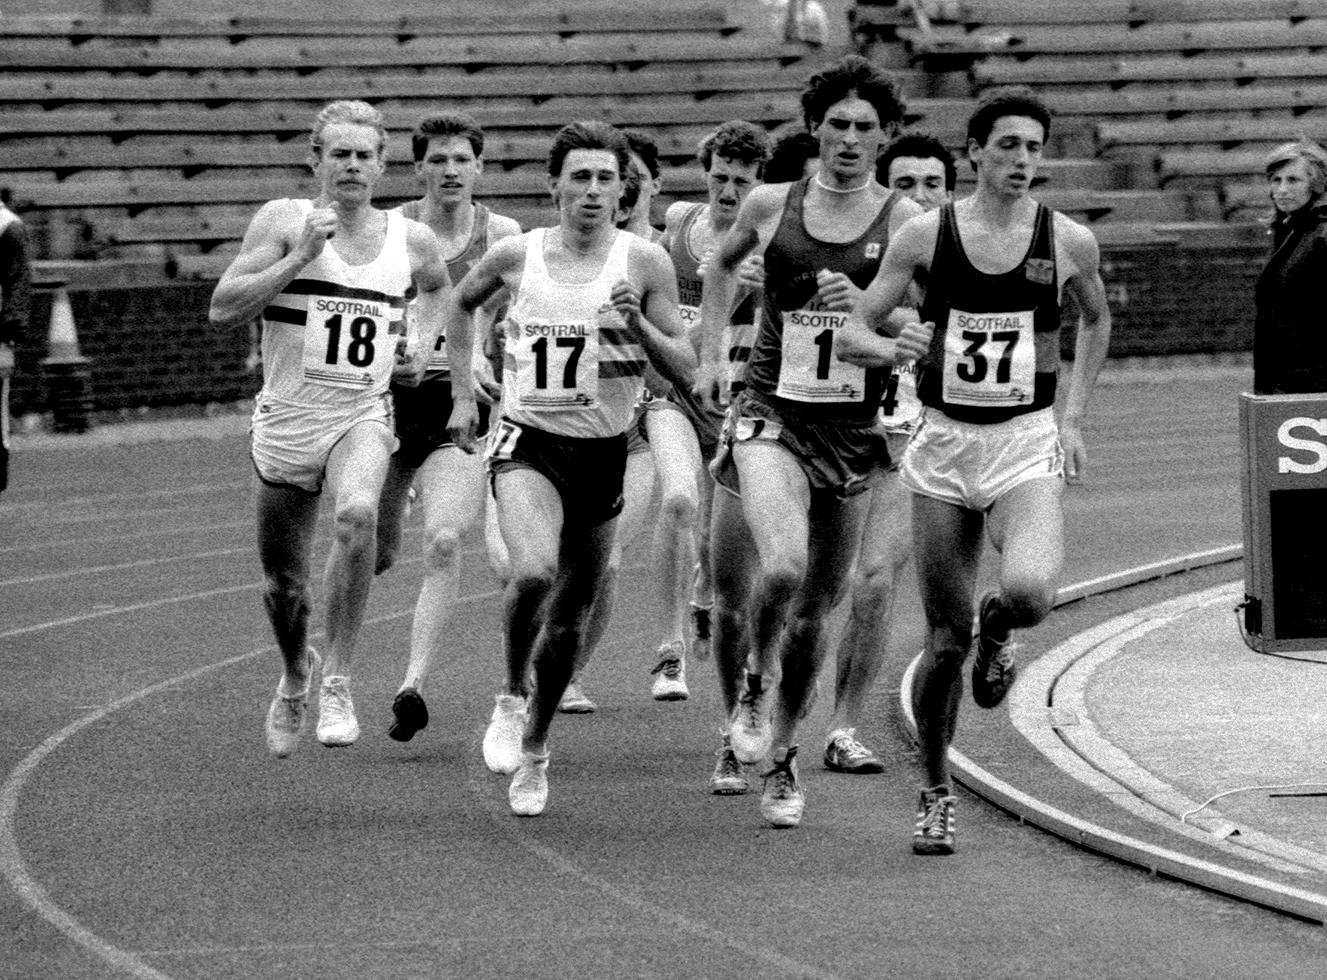 Currie, Callan, Robson, SAAA 1500m - 1985